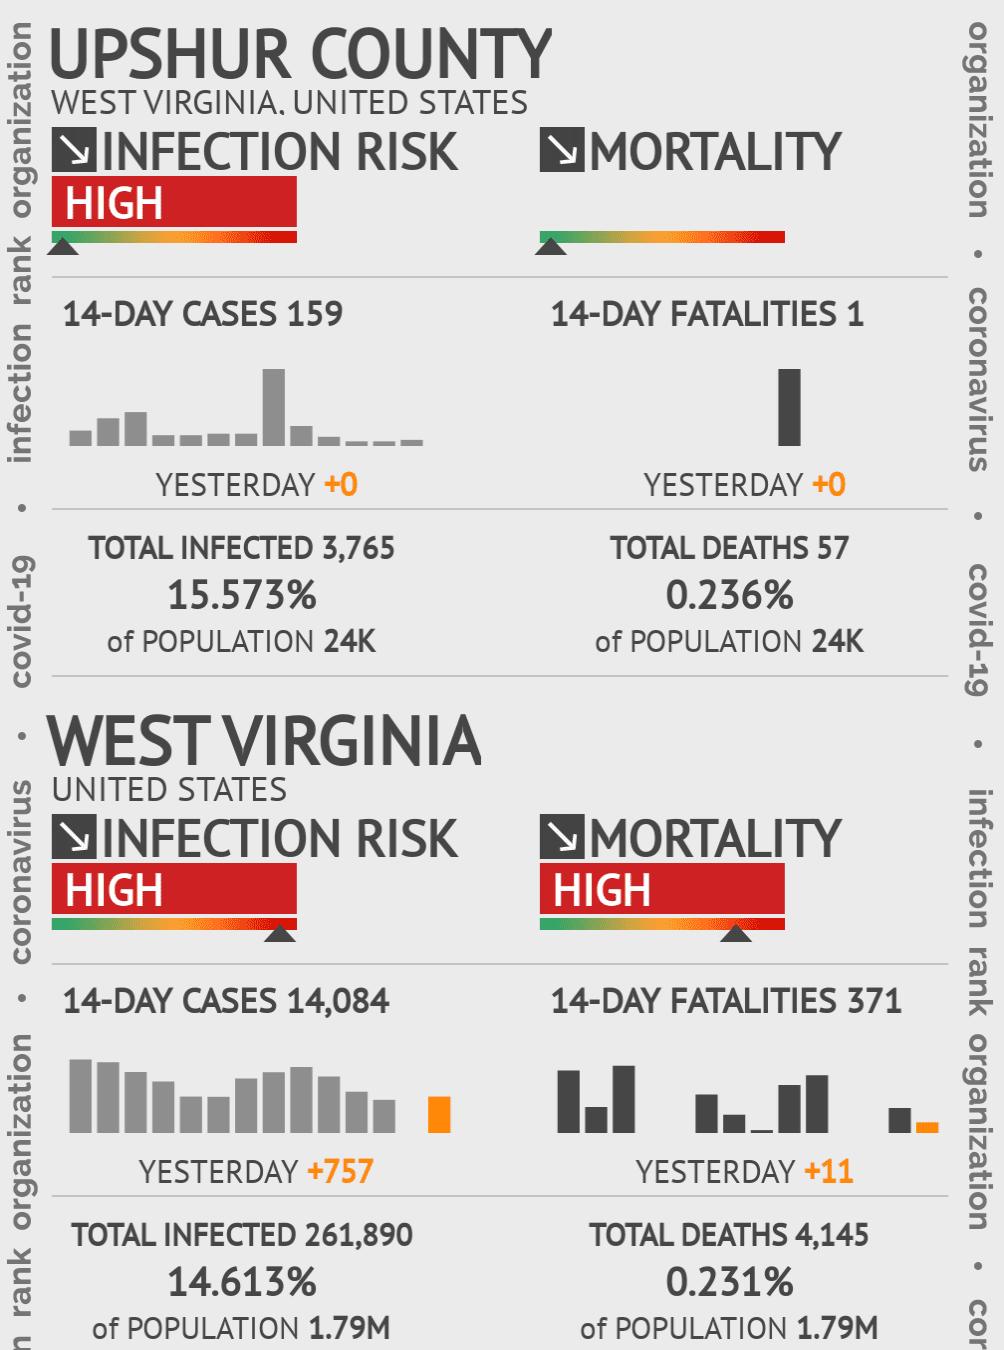 Upshur County Coronavirus Covid-19 Risk of Infection on July 24, 2021